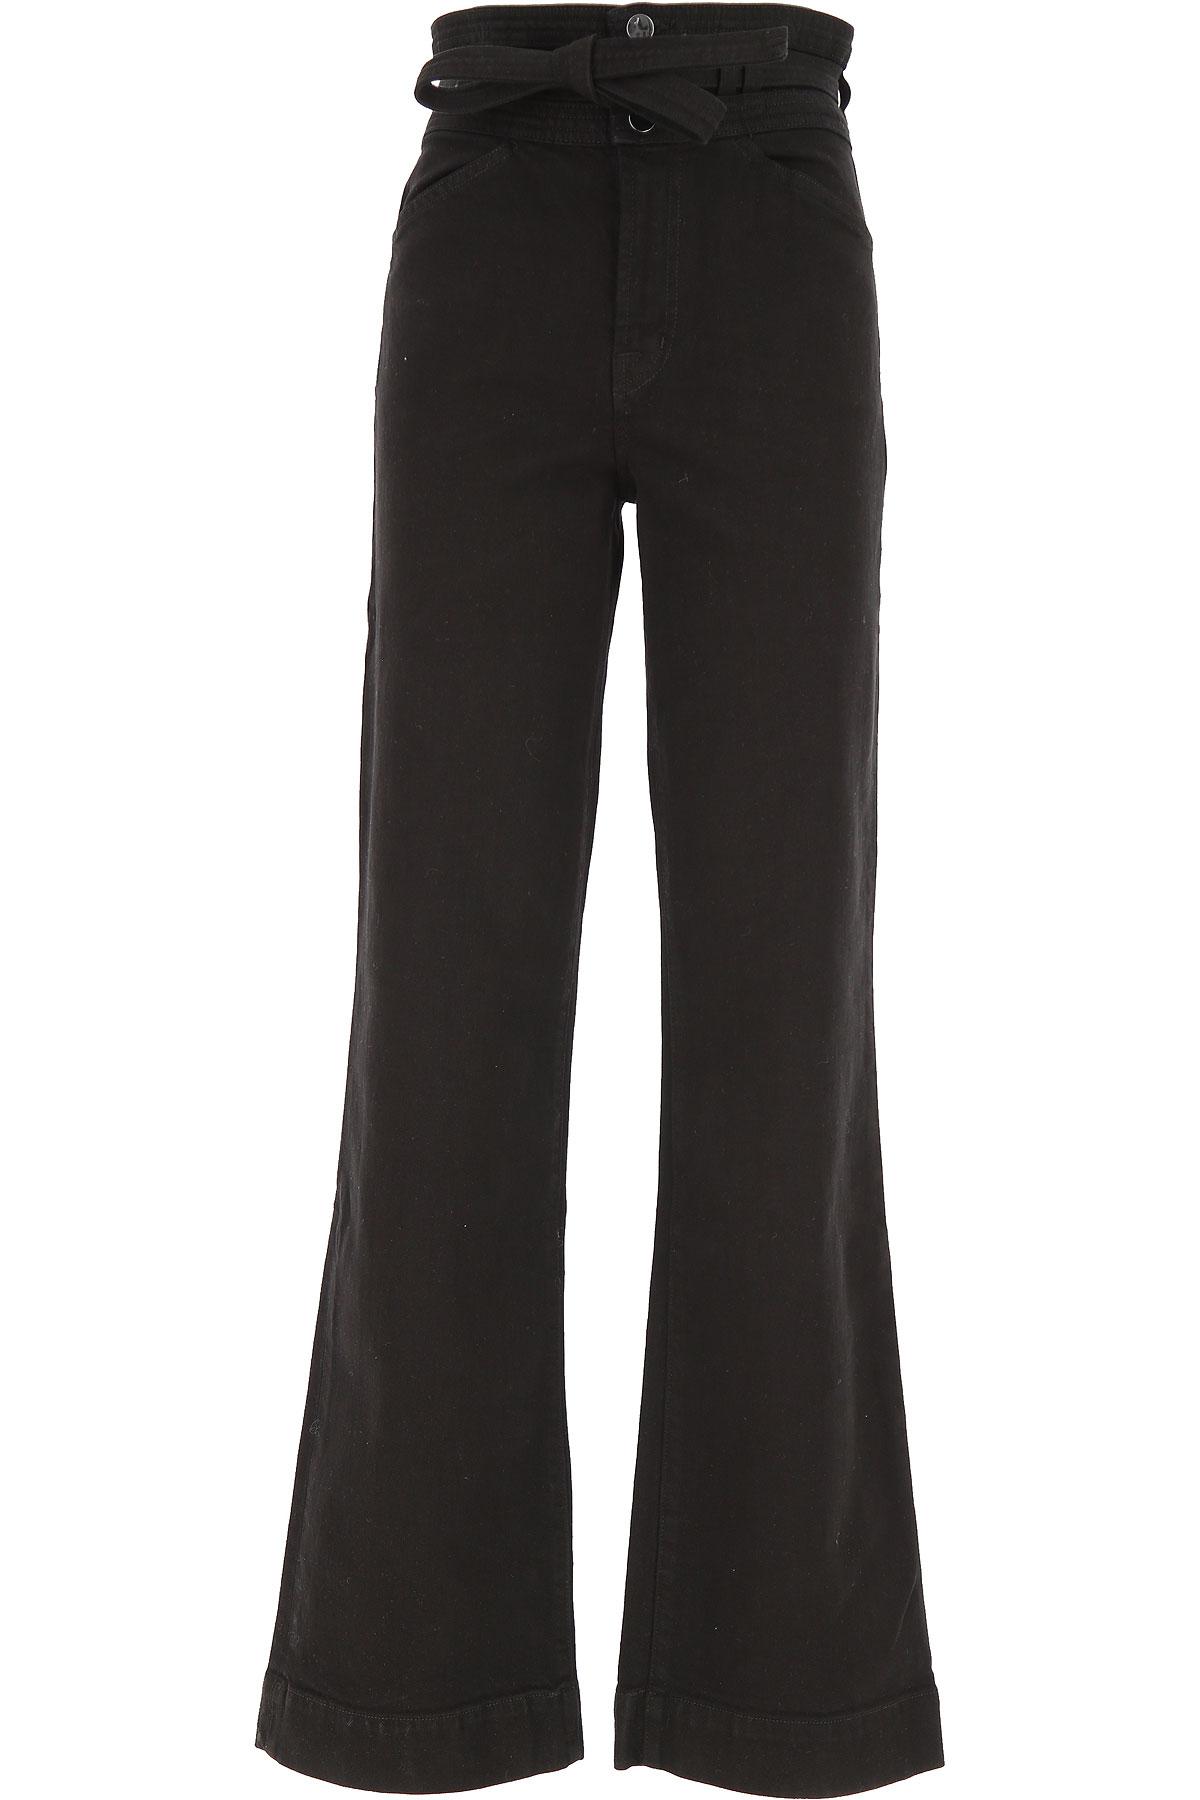 J Brand Pants for Women On Sale, Black, Cotton, 2019, 24 29